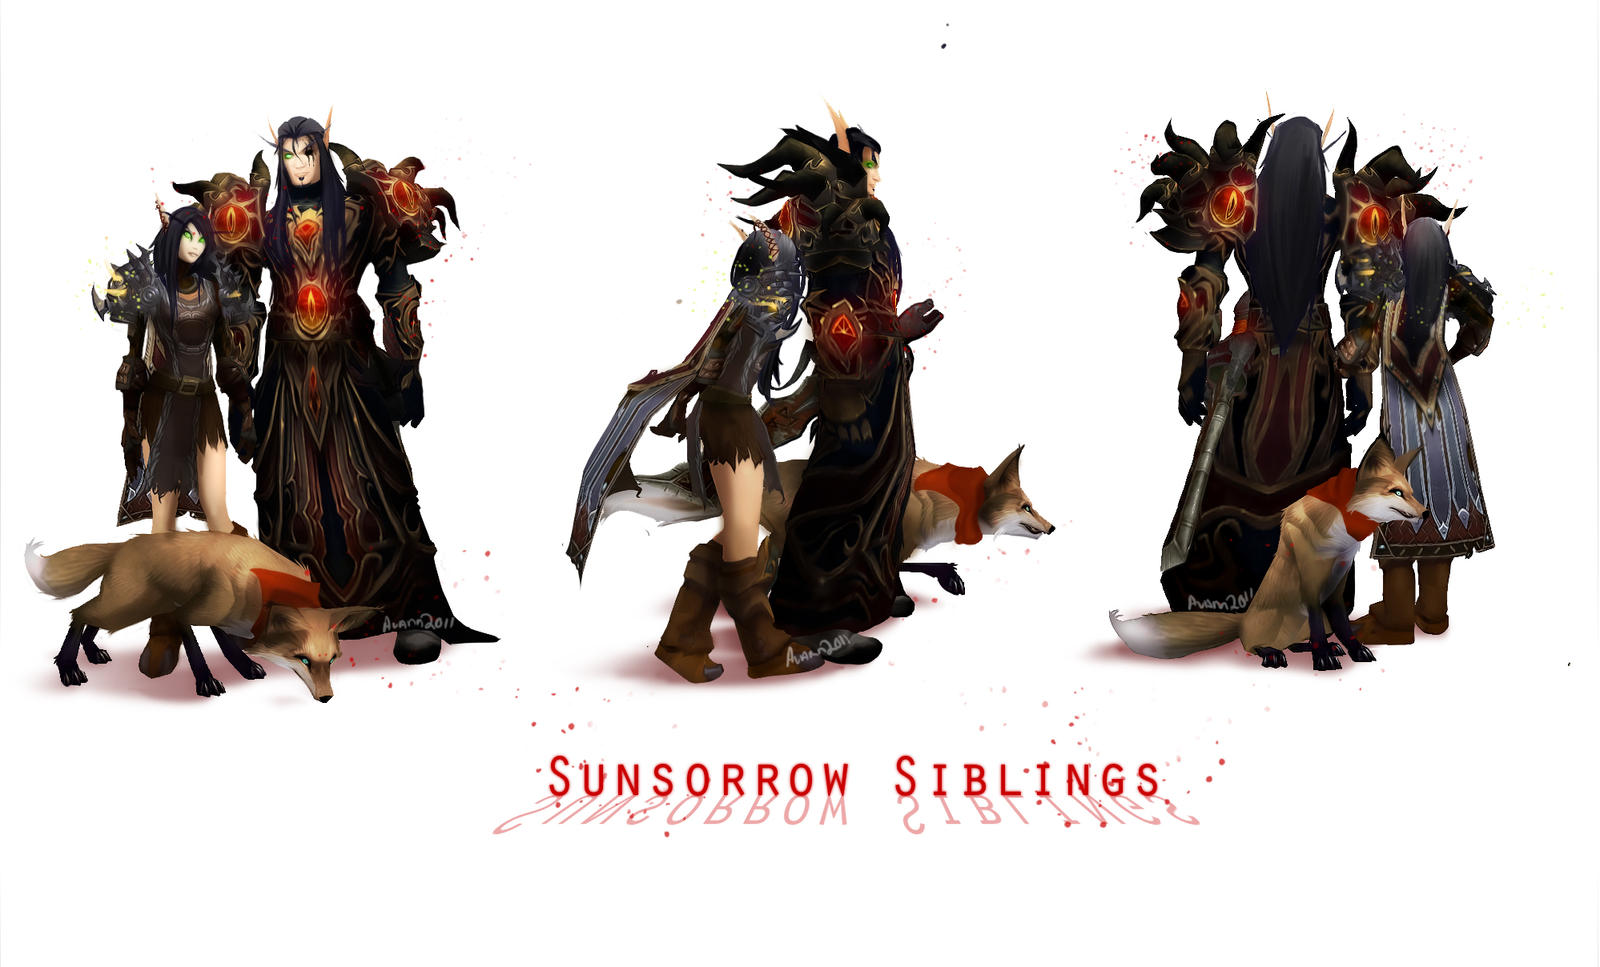 Sunsorrow Siblings by AvannTeth